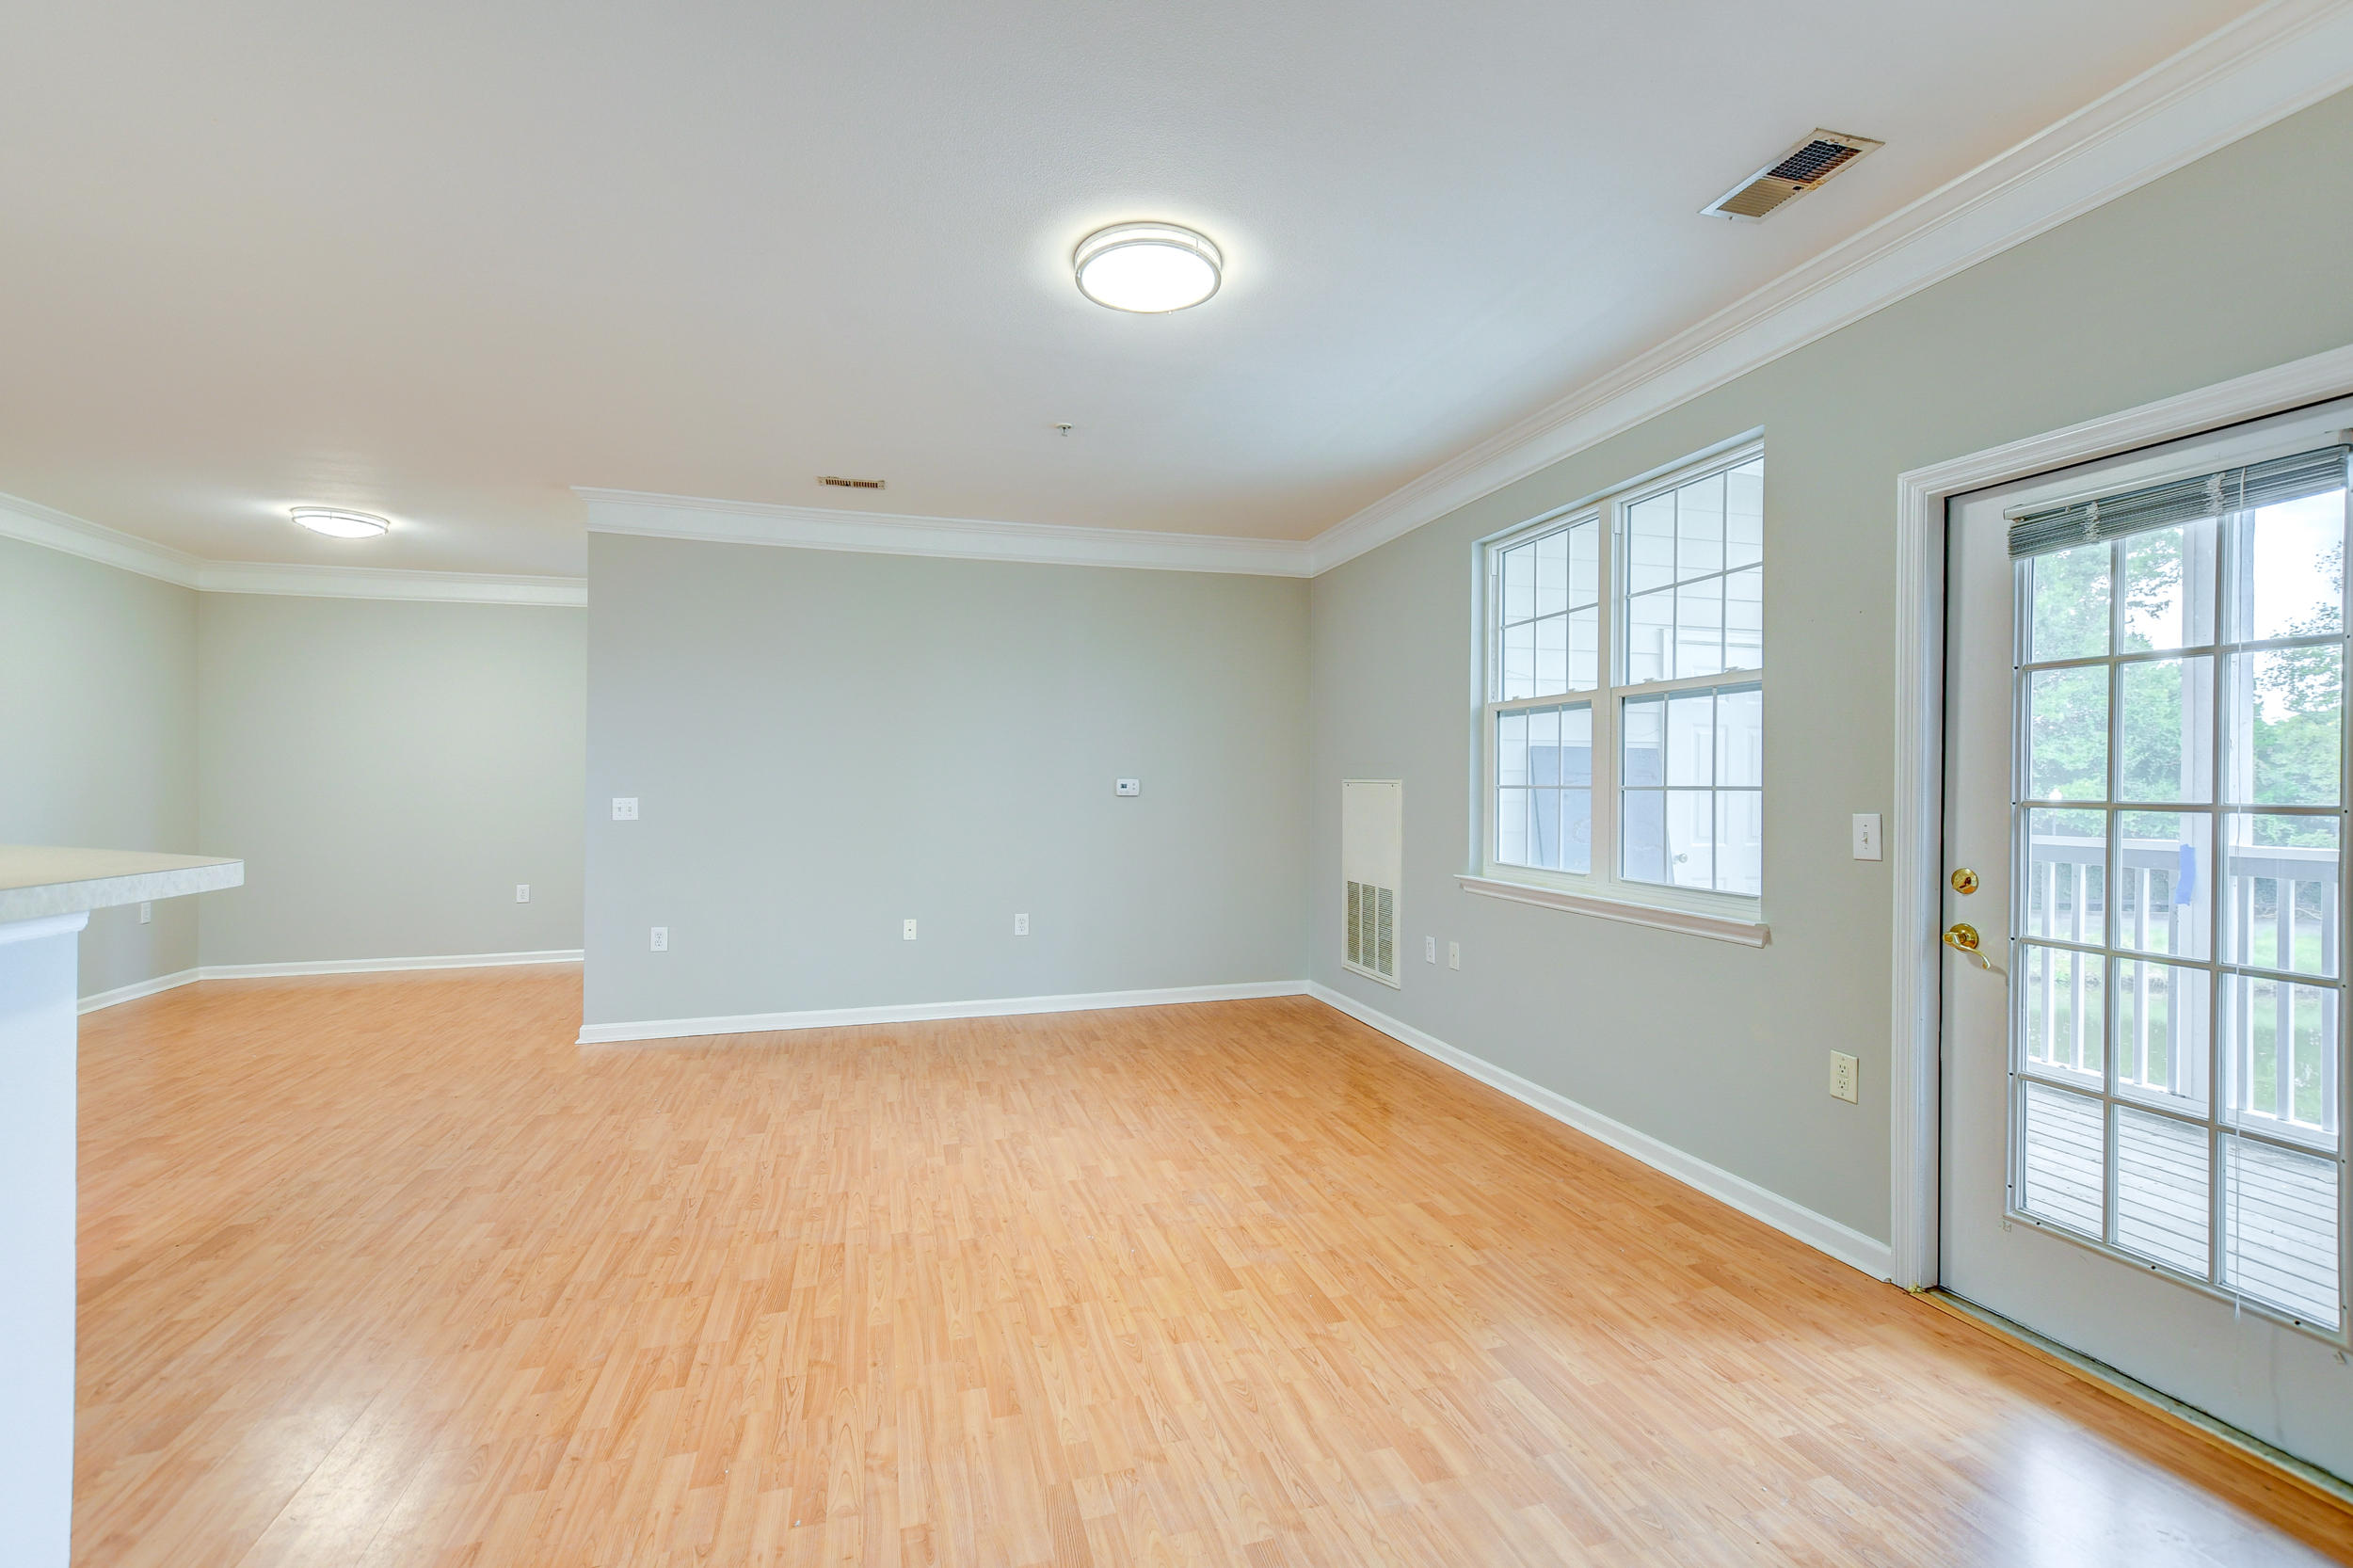 Cambridge Lakes Homes For Sale - 1445 Cambridge Lakes, Mount Pleasant, SC - 3